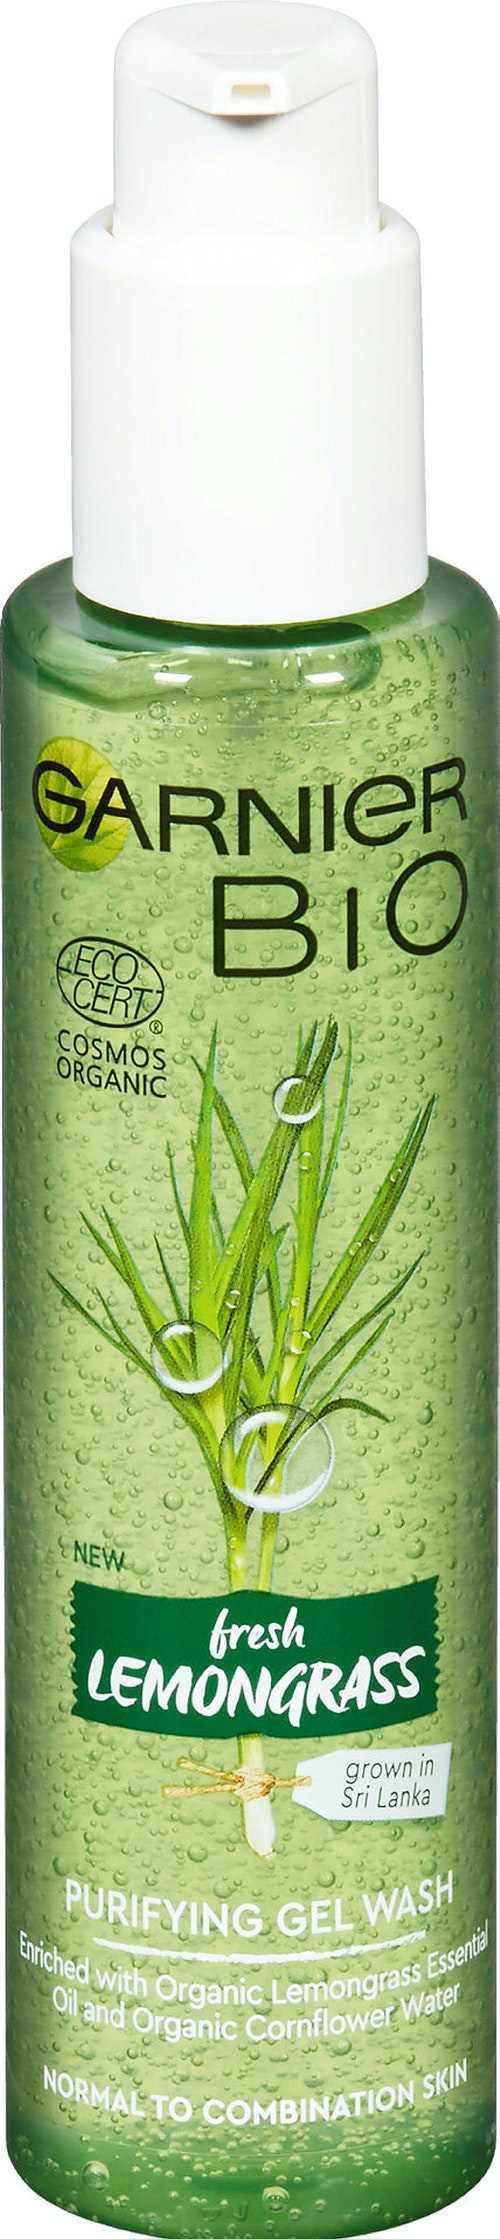 Garnier Lemongrass Purifying Gel Wash Cleanser, 150 ml